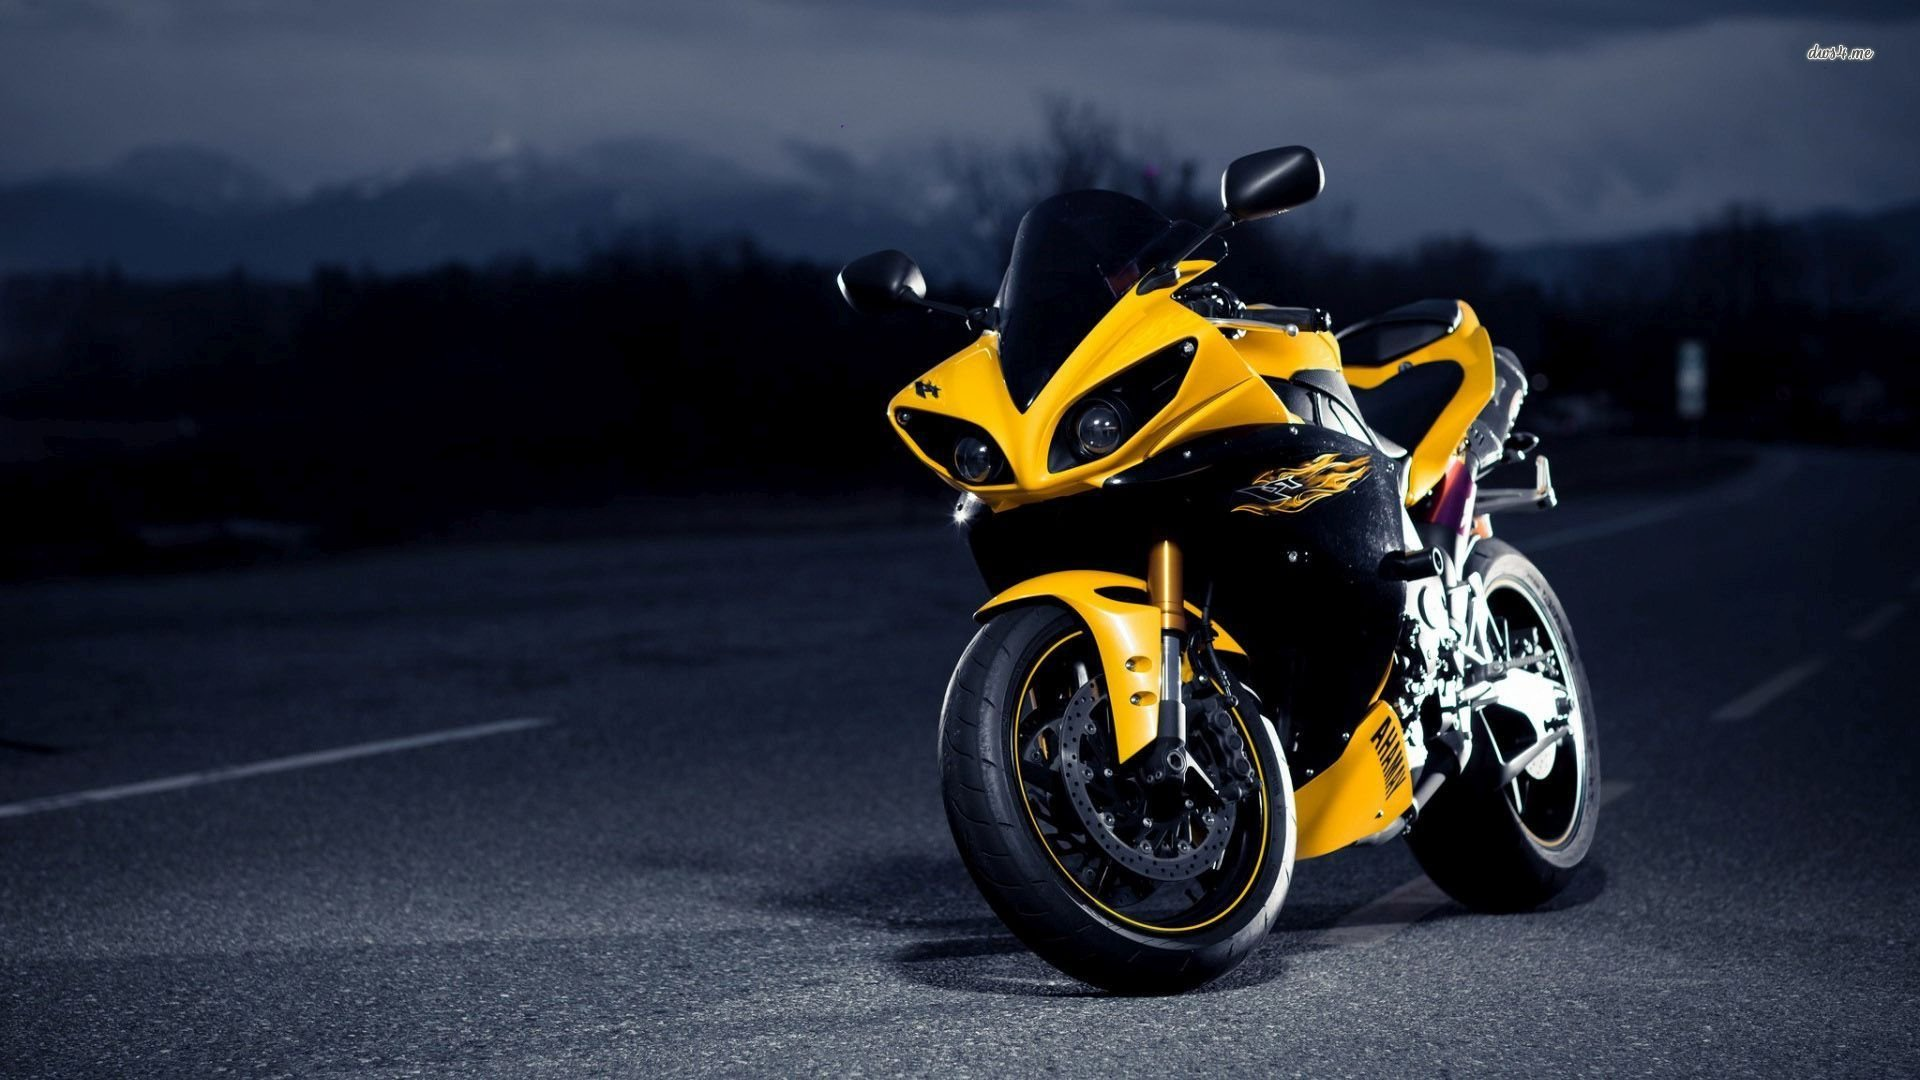 29106 Yamaha Yzf R1 1920x1080 Motorcycle Wallpaper